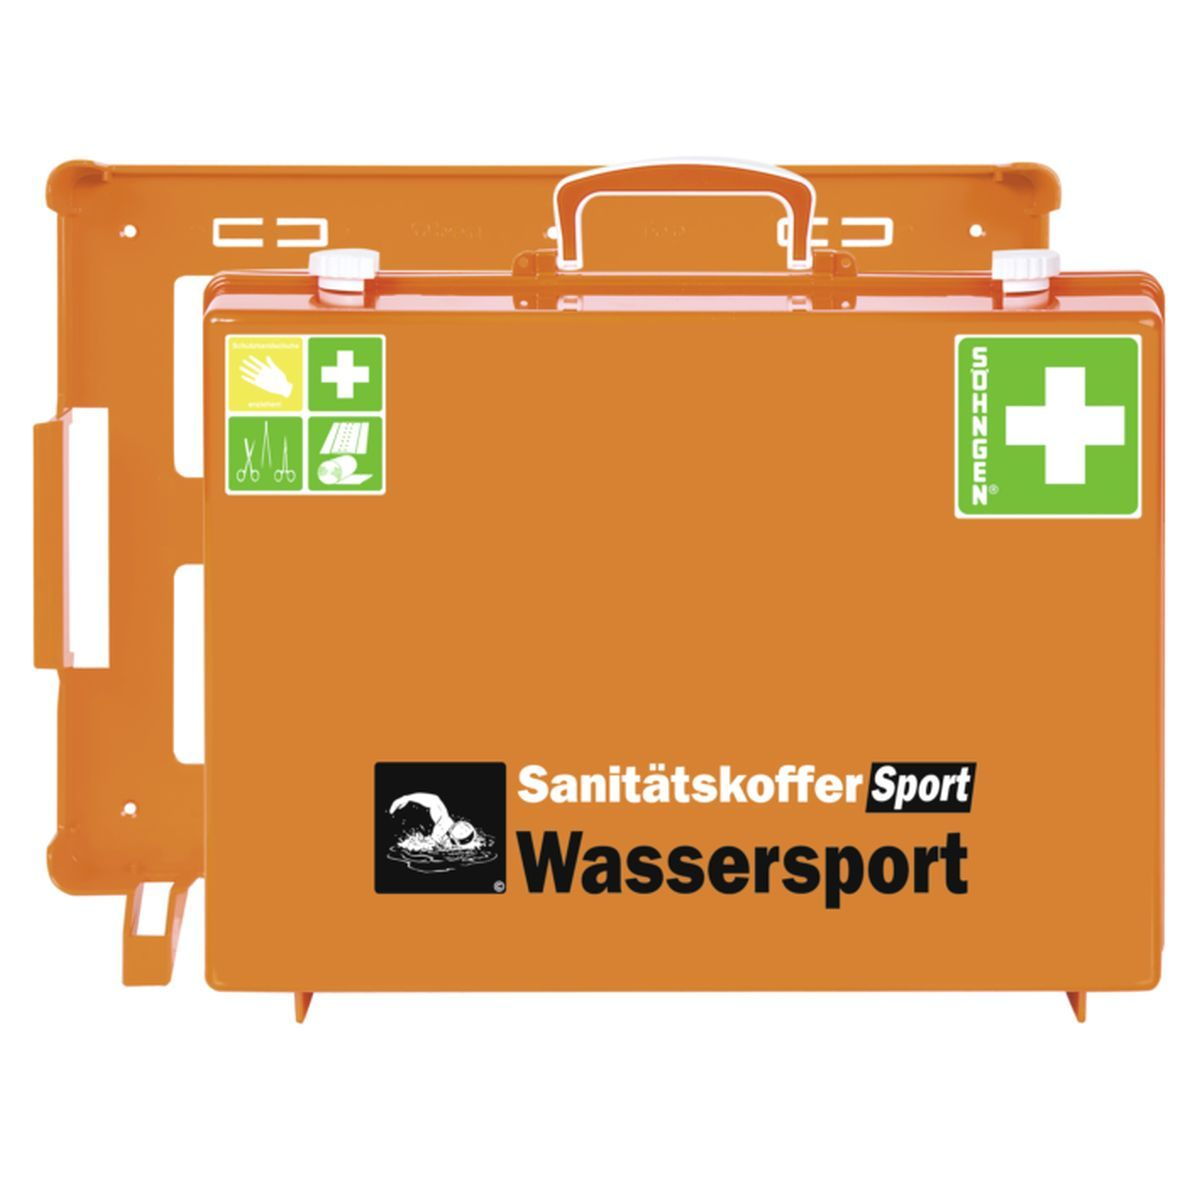 Sanitätskoffer Sport Wassersport